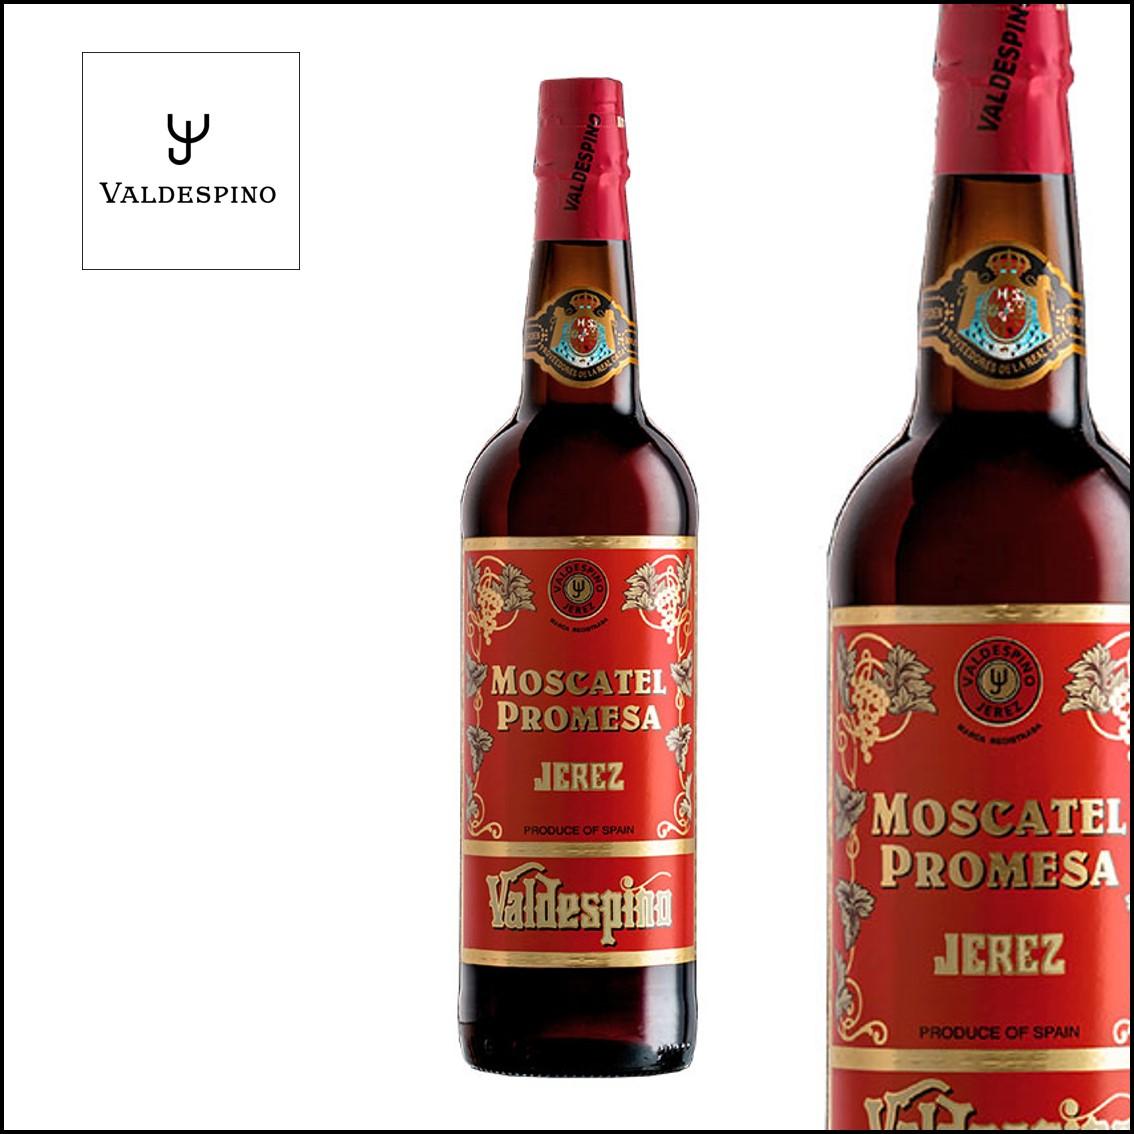 Valdespino «Promesa» Moscatel